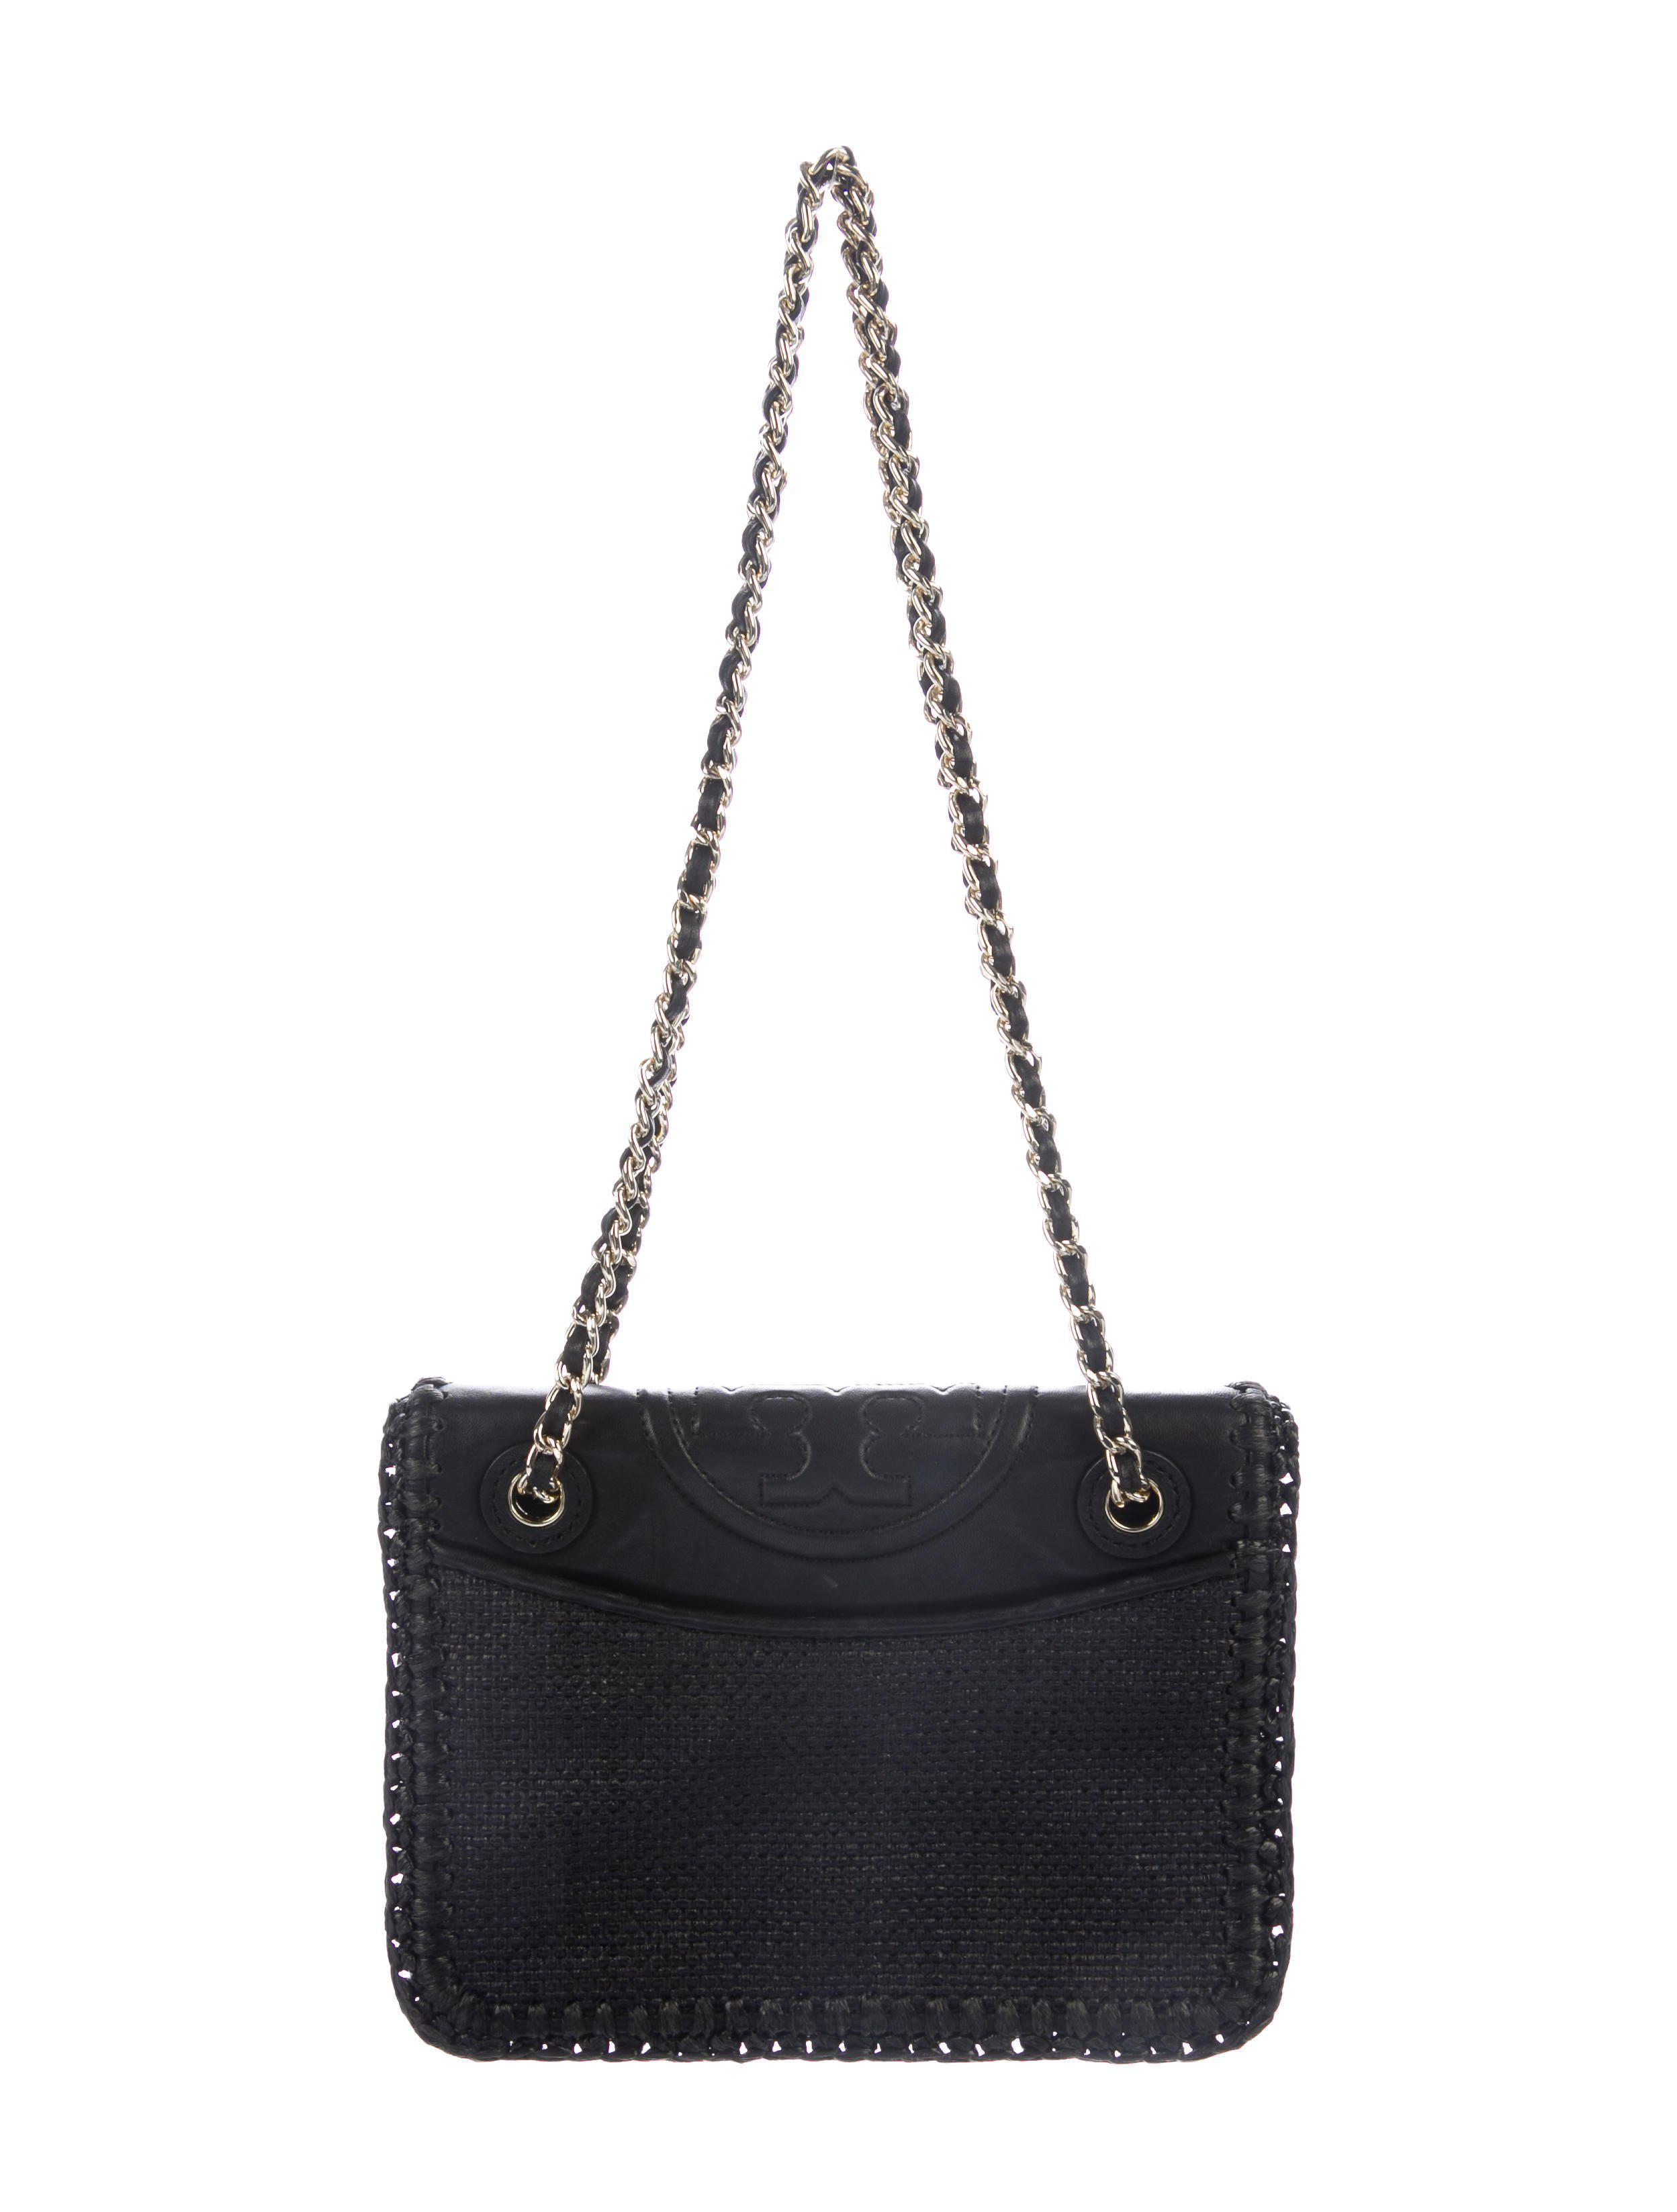 5763983a92fa Lyst - Tory Burch Fleming Crochet Medium Flap Bag Black in Metallic